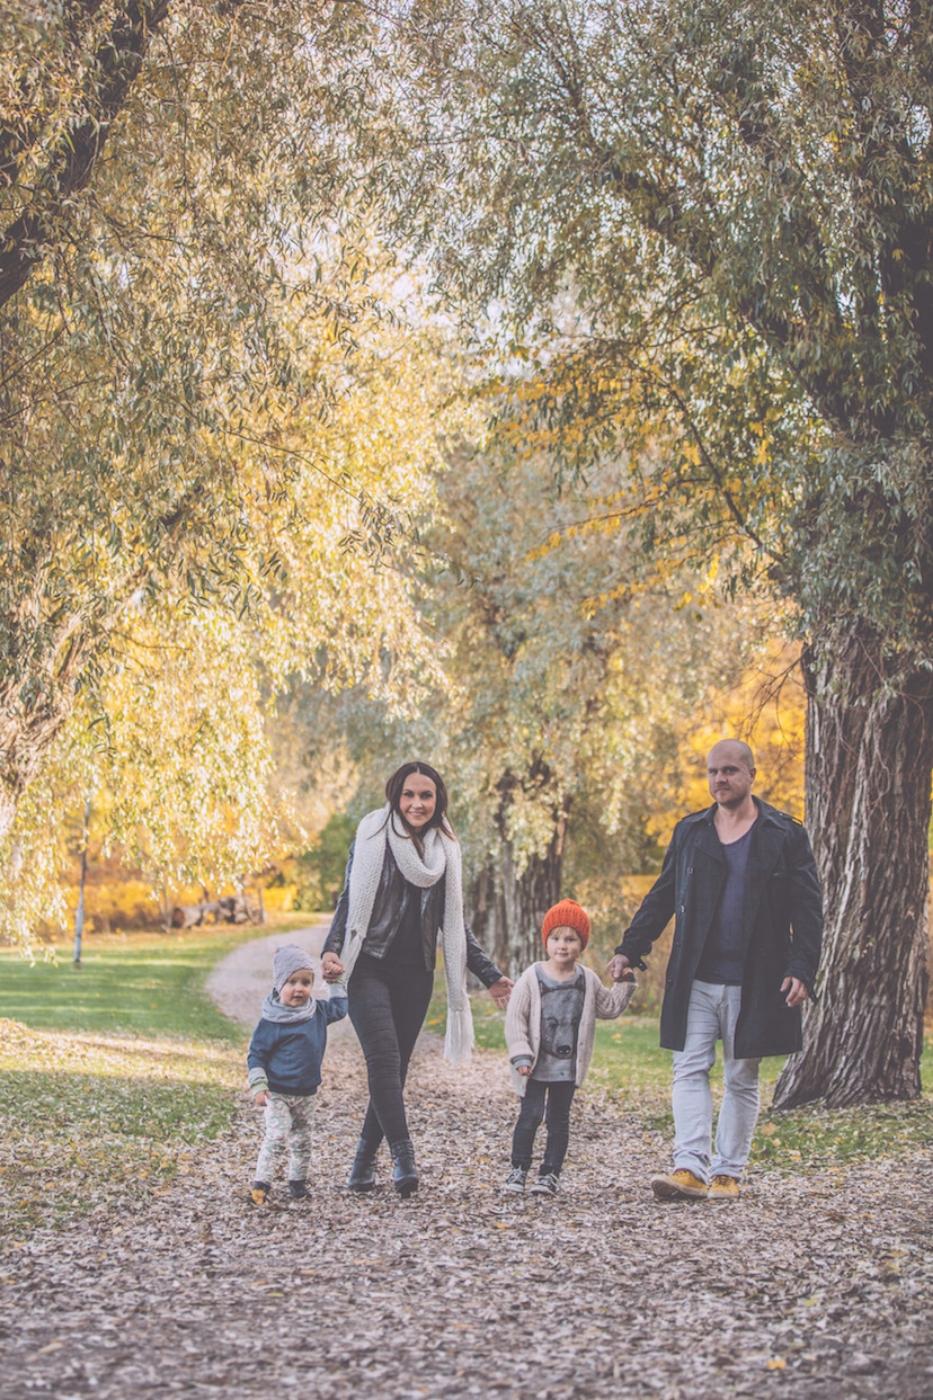 autumn family portrait on location